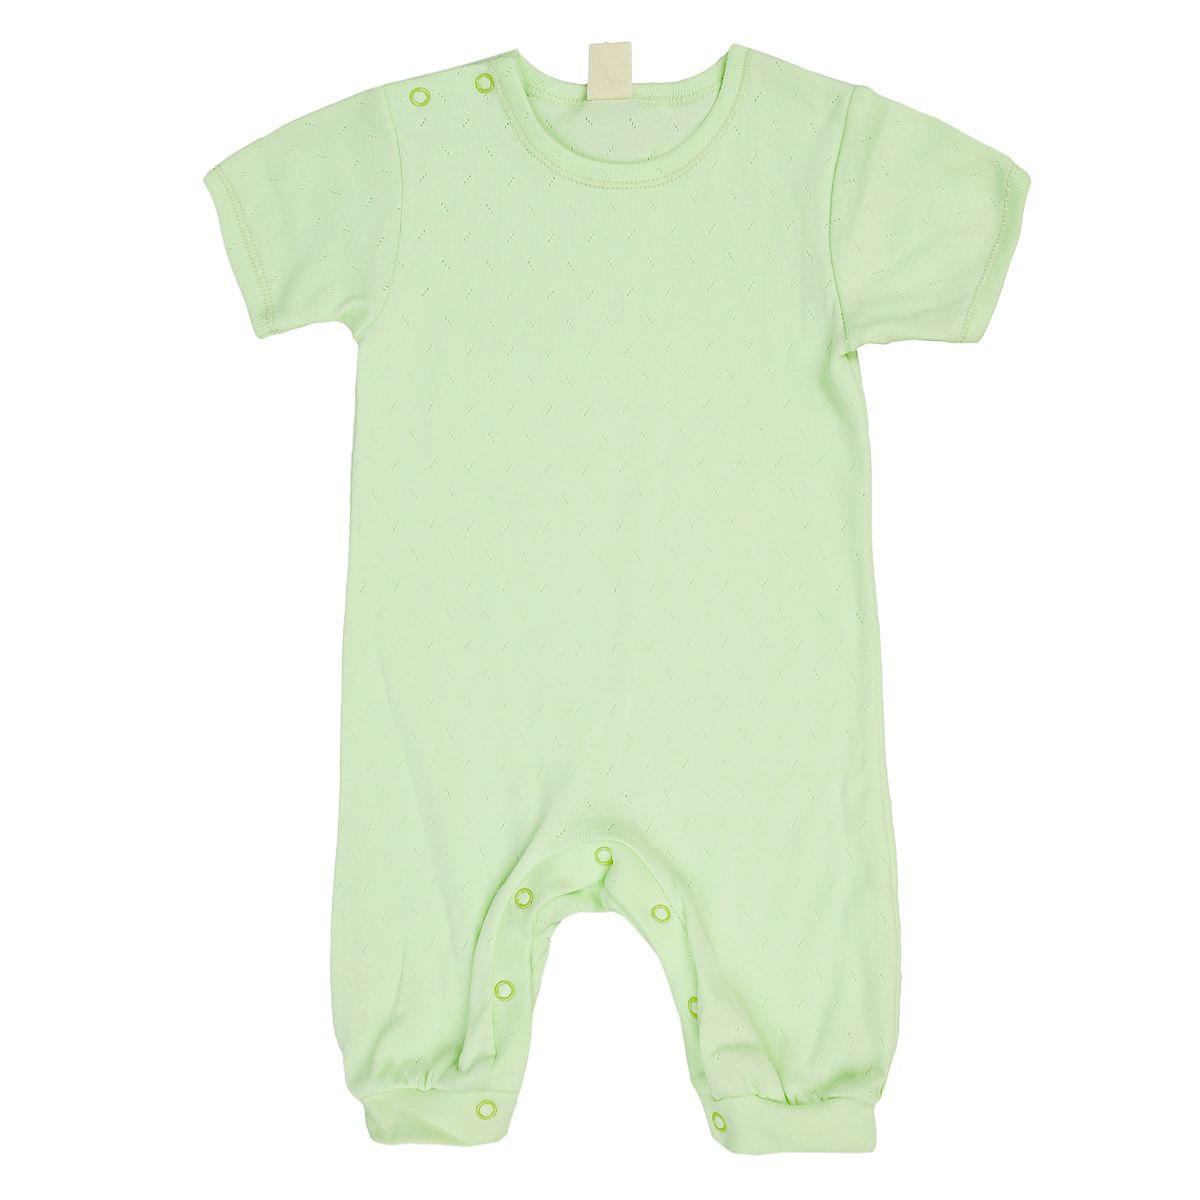 Песочник Lucky Child Ажур зеленый 74-80 фото